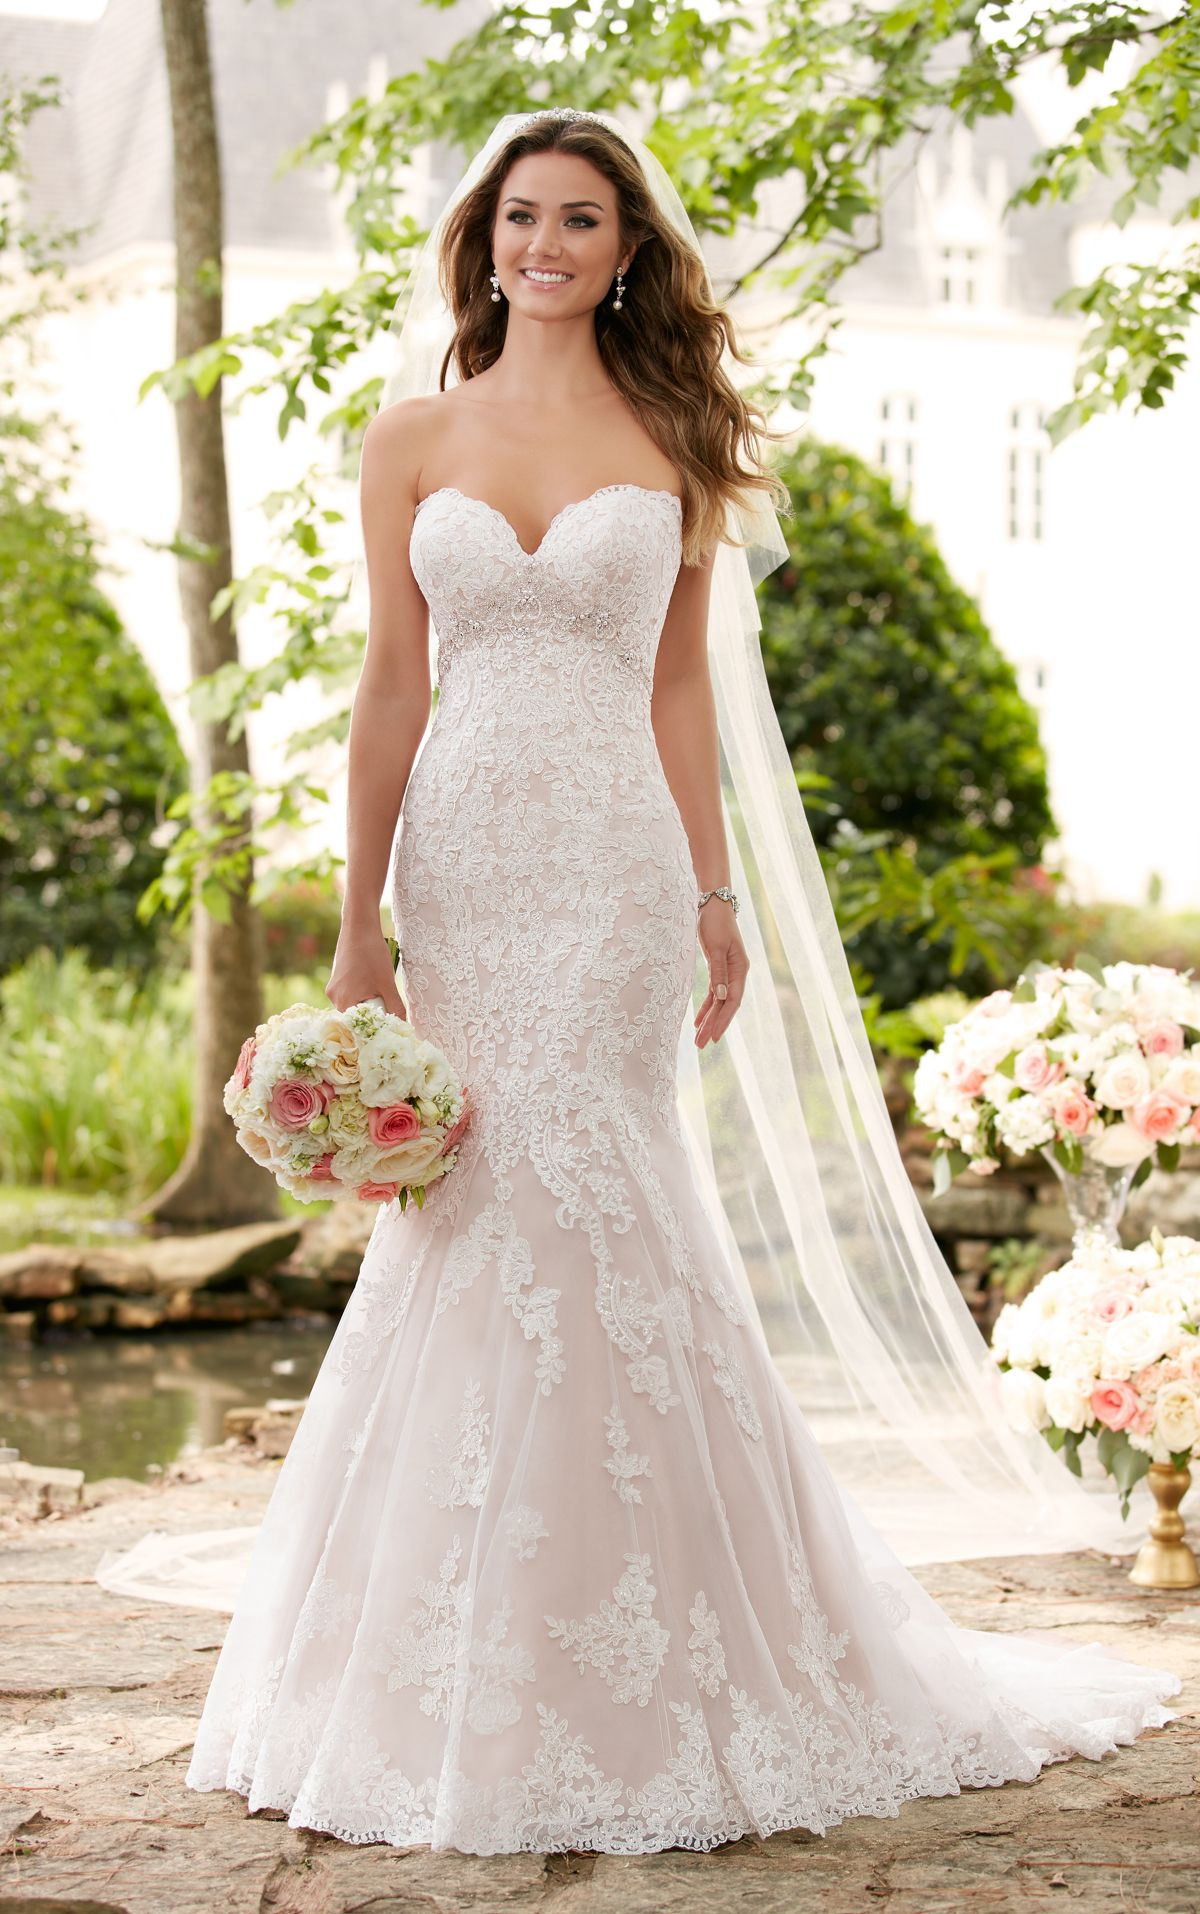 Wedding Dresses   Romantic Lace Wedding Gown   Stella York ...